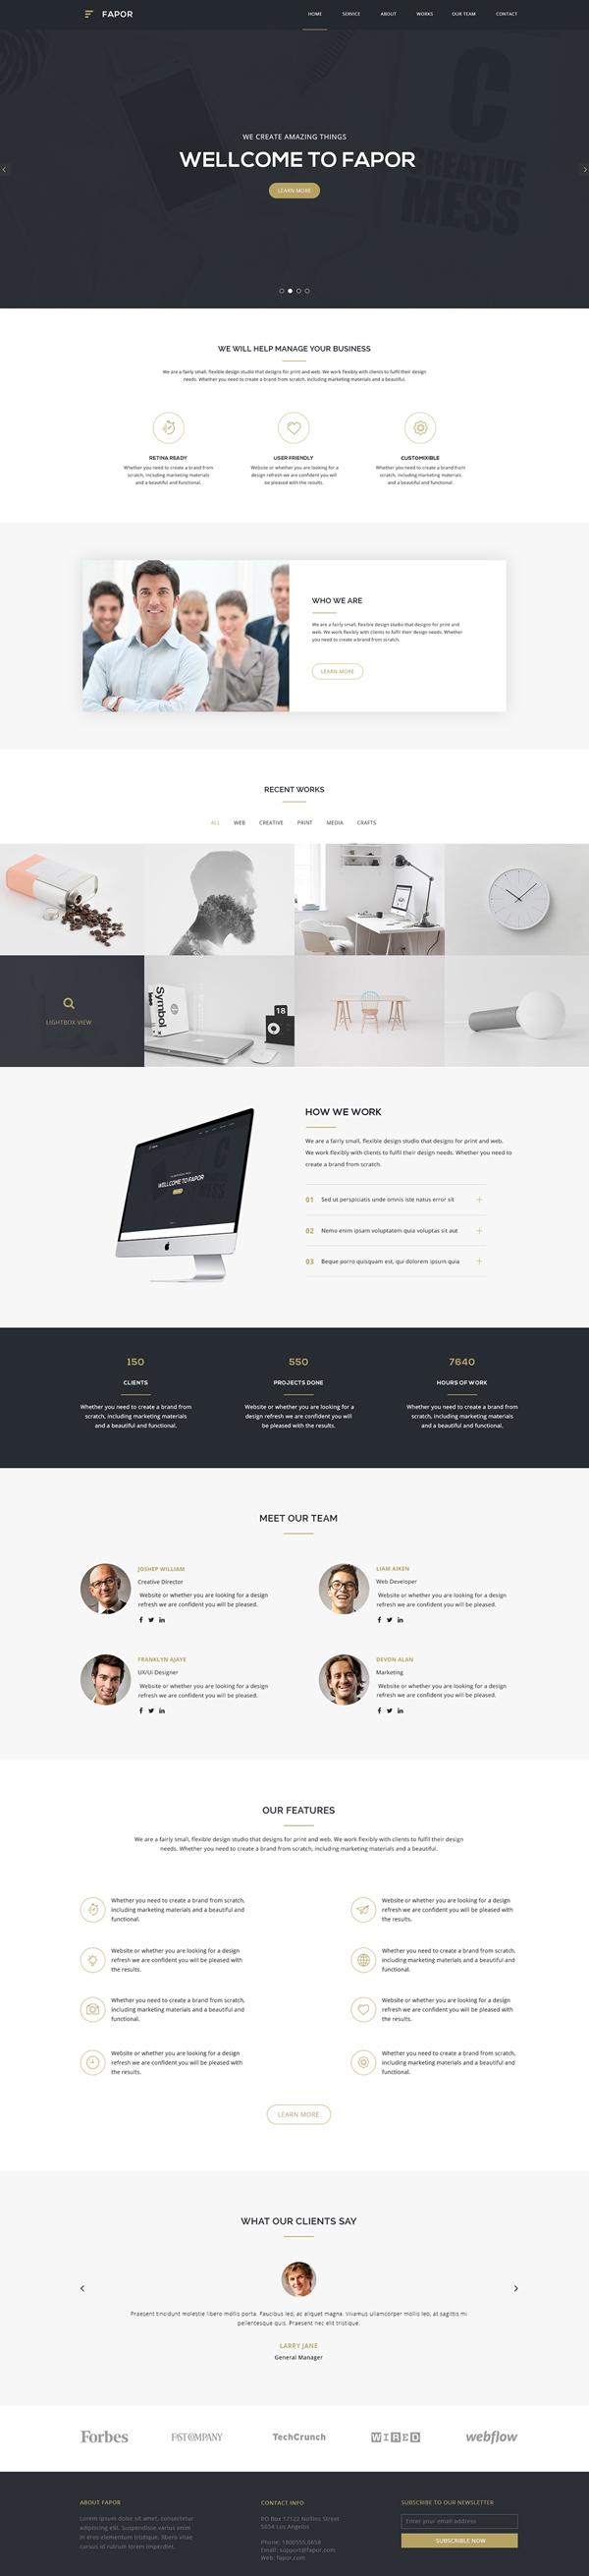 Free Creative Agency Website PSD Template